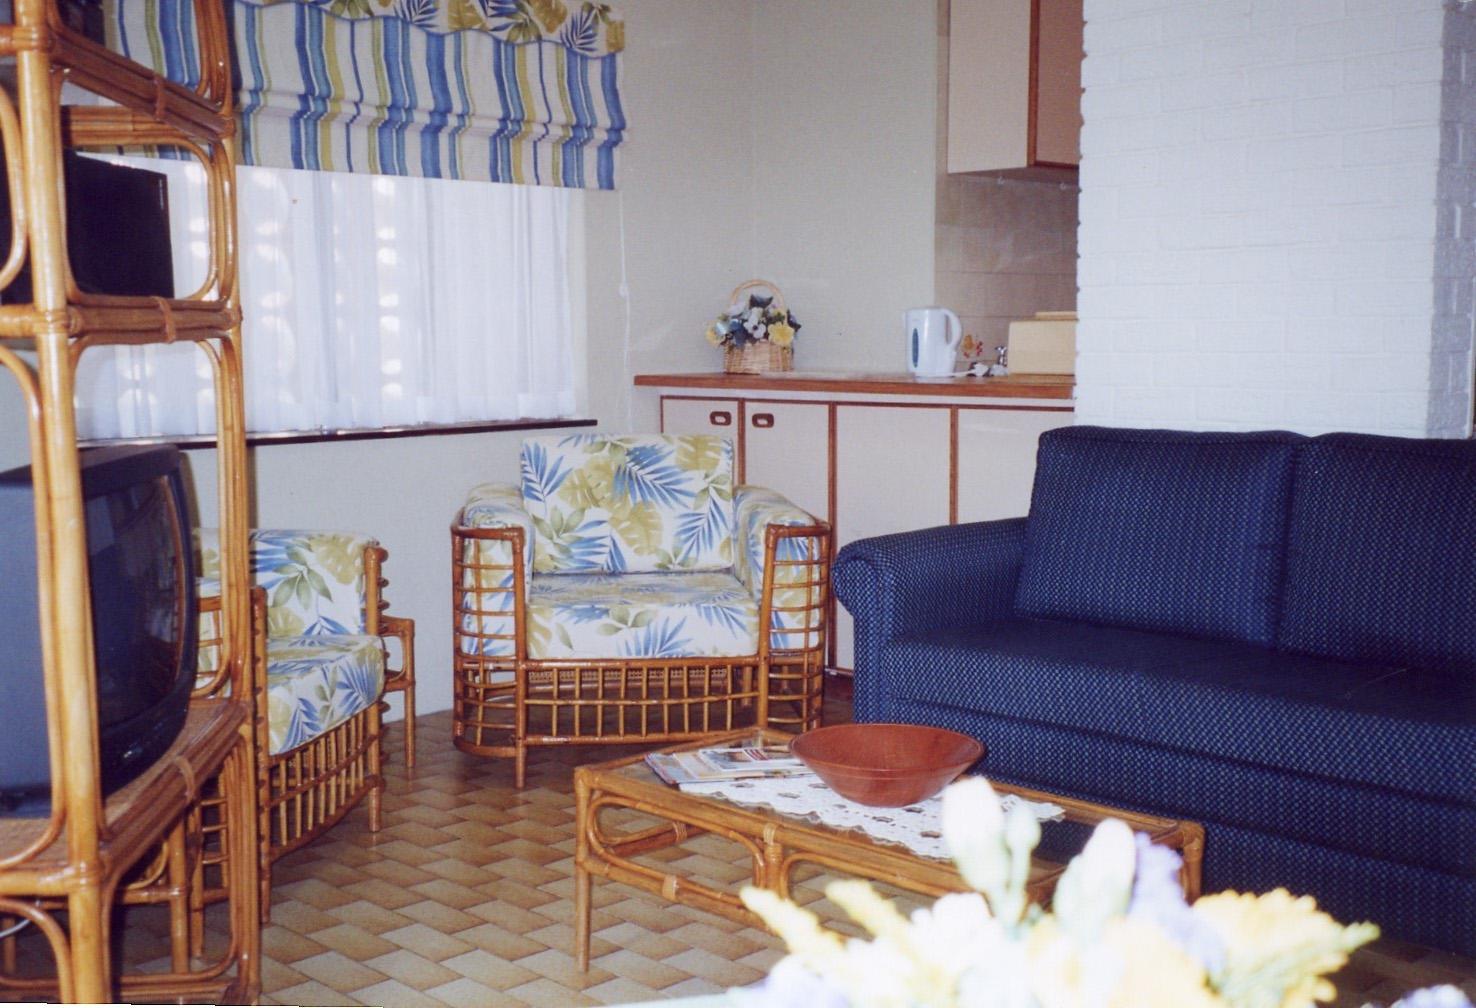 int_livingroom3